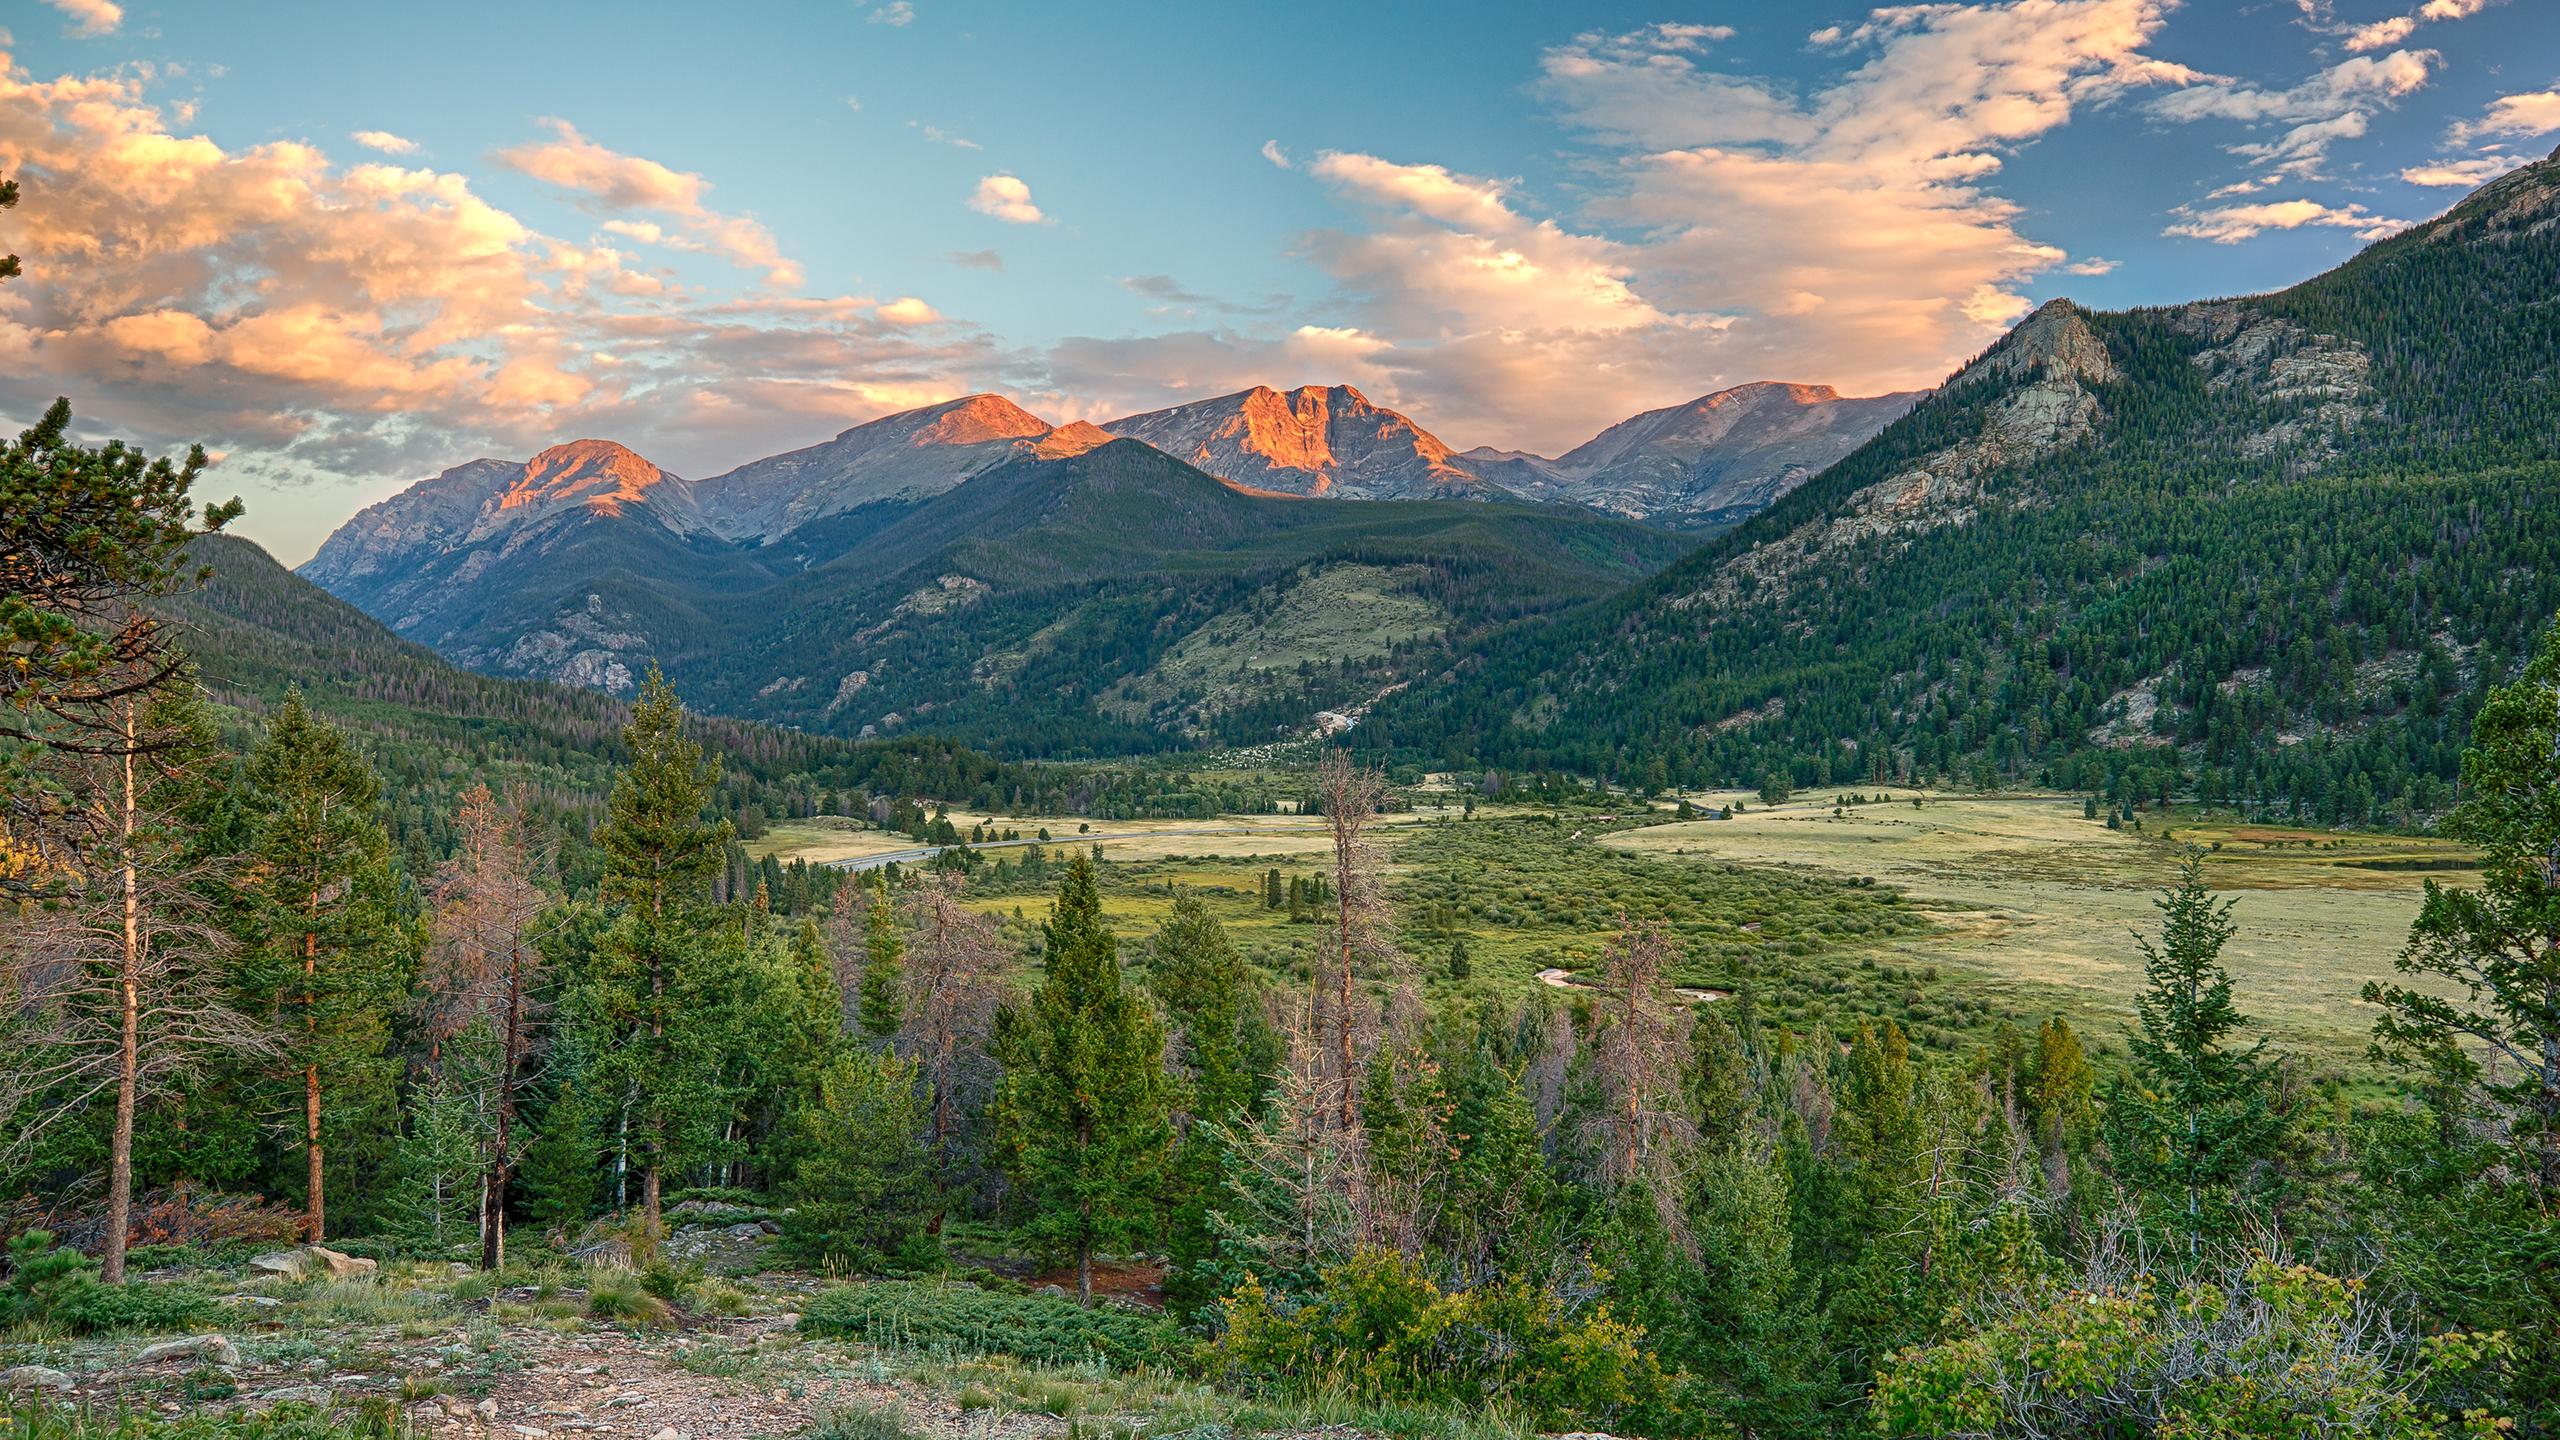 Best Wallpaper Mountain Sunrise - rocky_mountain_sunrise_wallpaper_2560x1440  Picture_752793.jpg?200